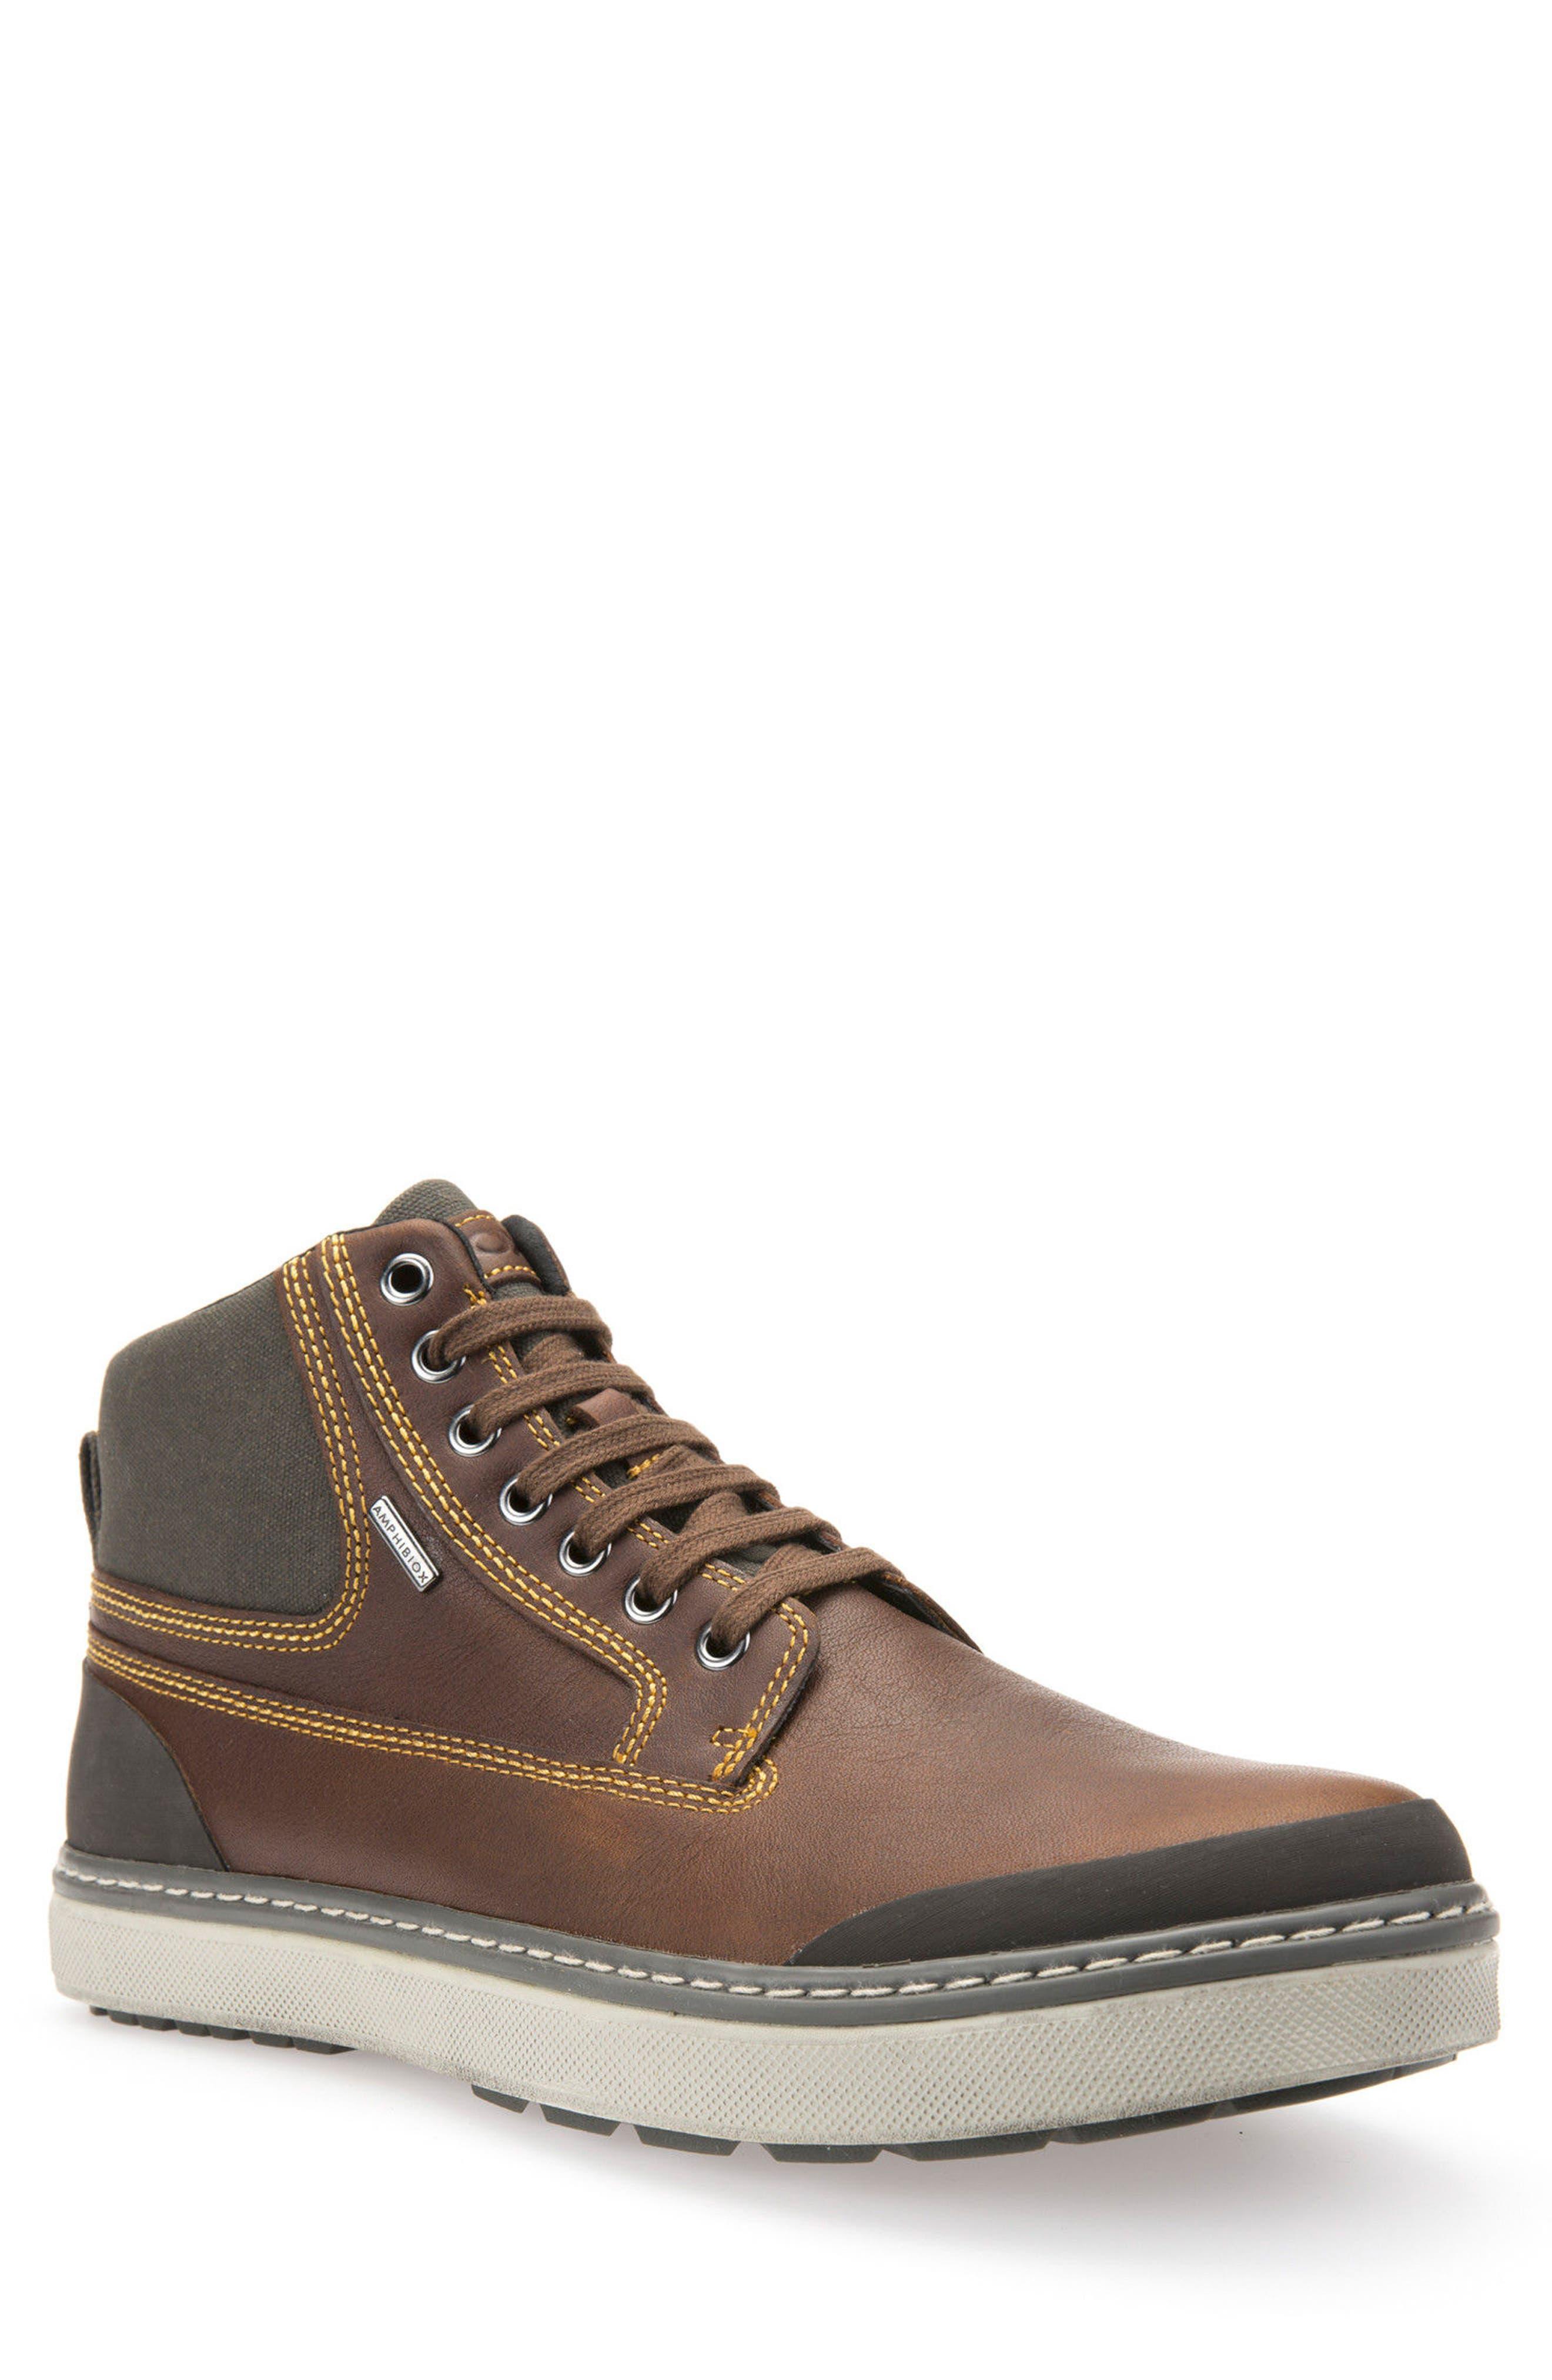 Mattias Amphibiox Waterproof Leather Sneaker,                         Main,                         color, Brown/ Brown